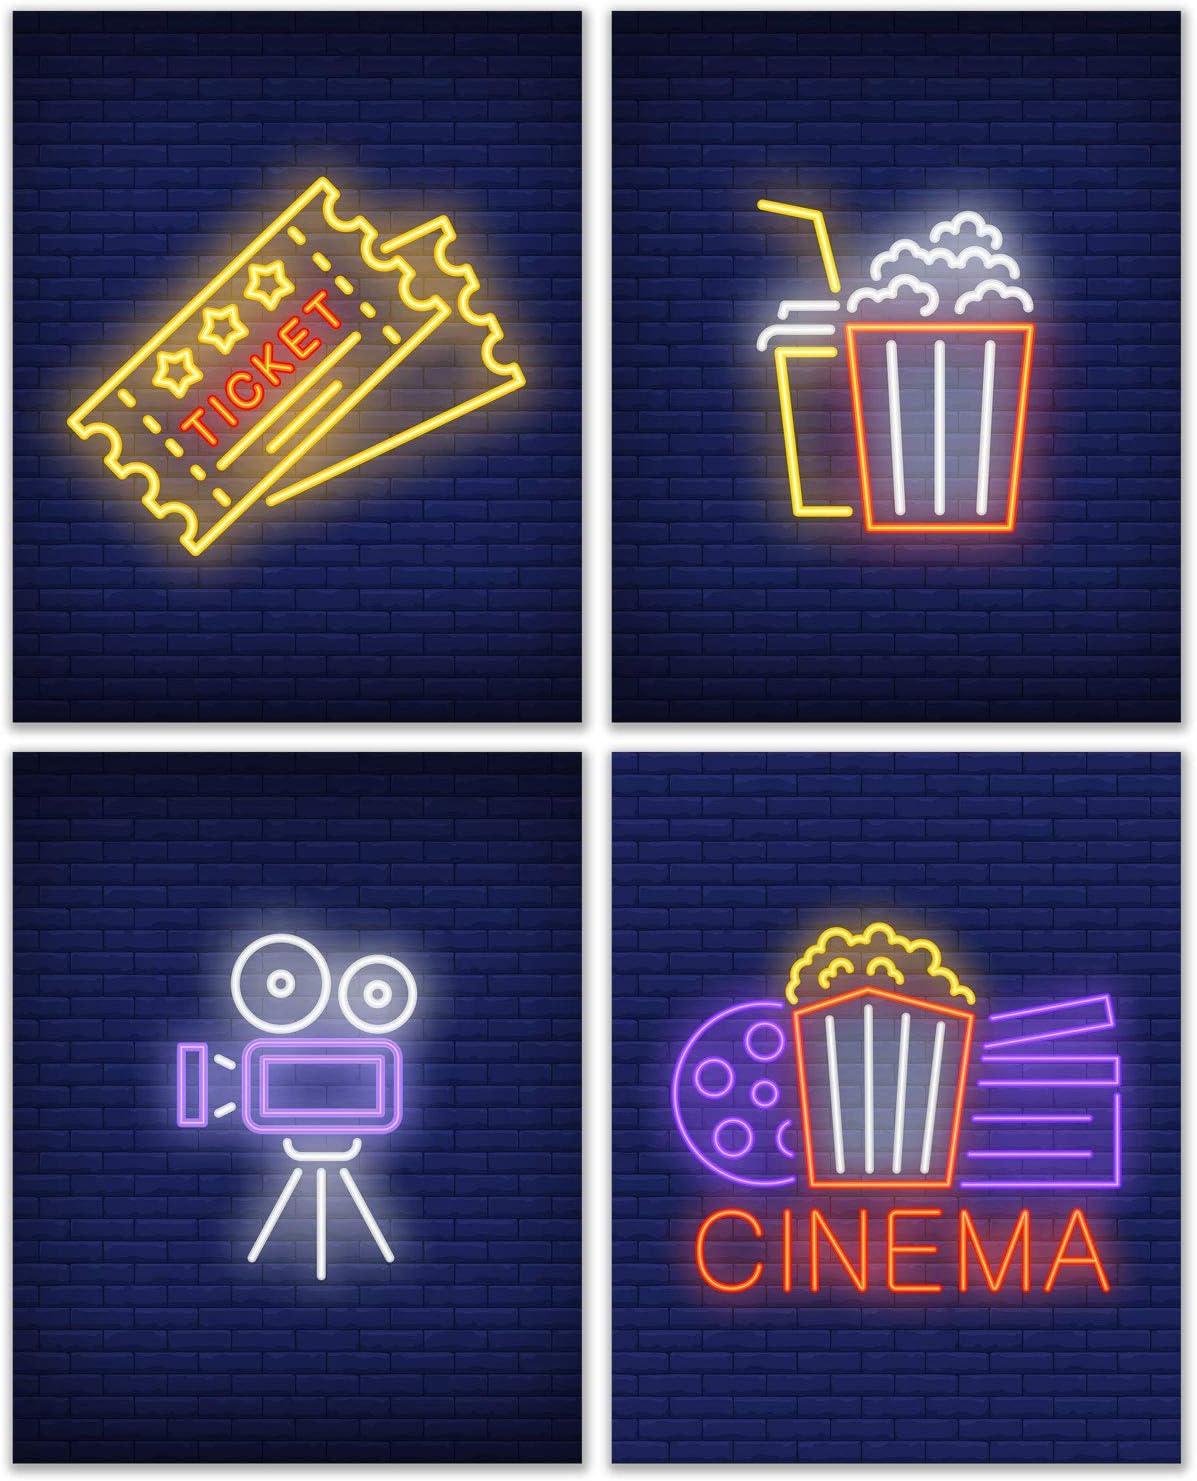 Cinema Home Theatre Wall Art Decor Prints - Set of 4 (8x10) Inch Poster Photos - Basement Entertainment - Gift Idea